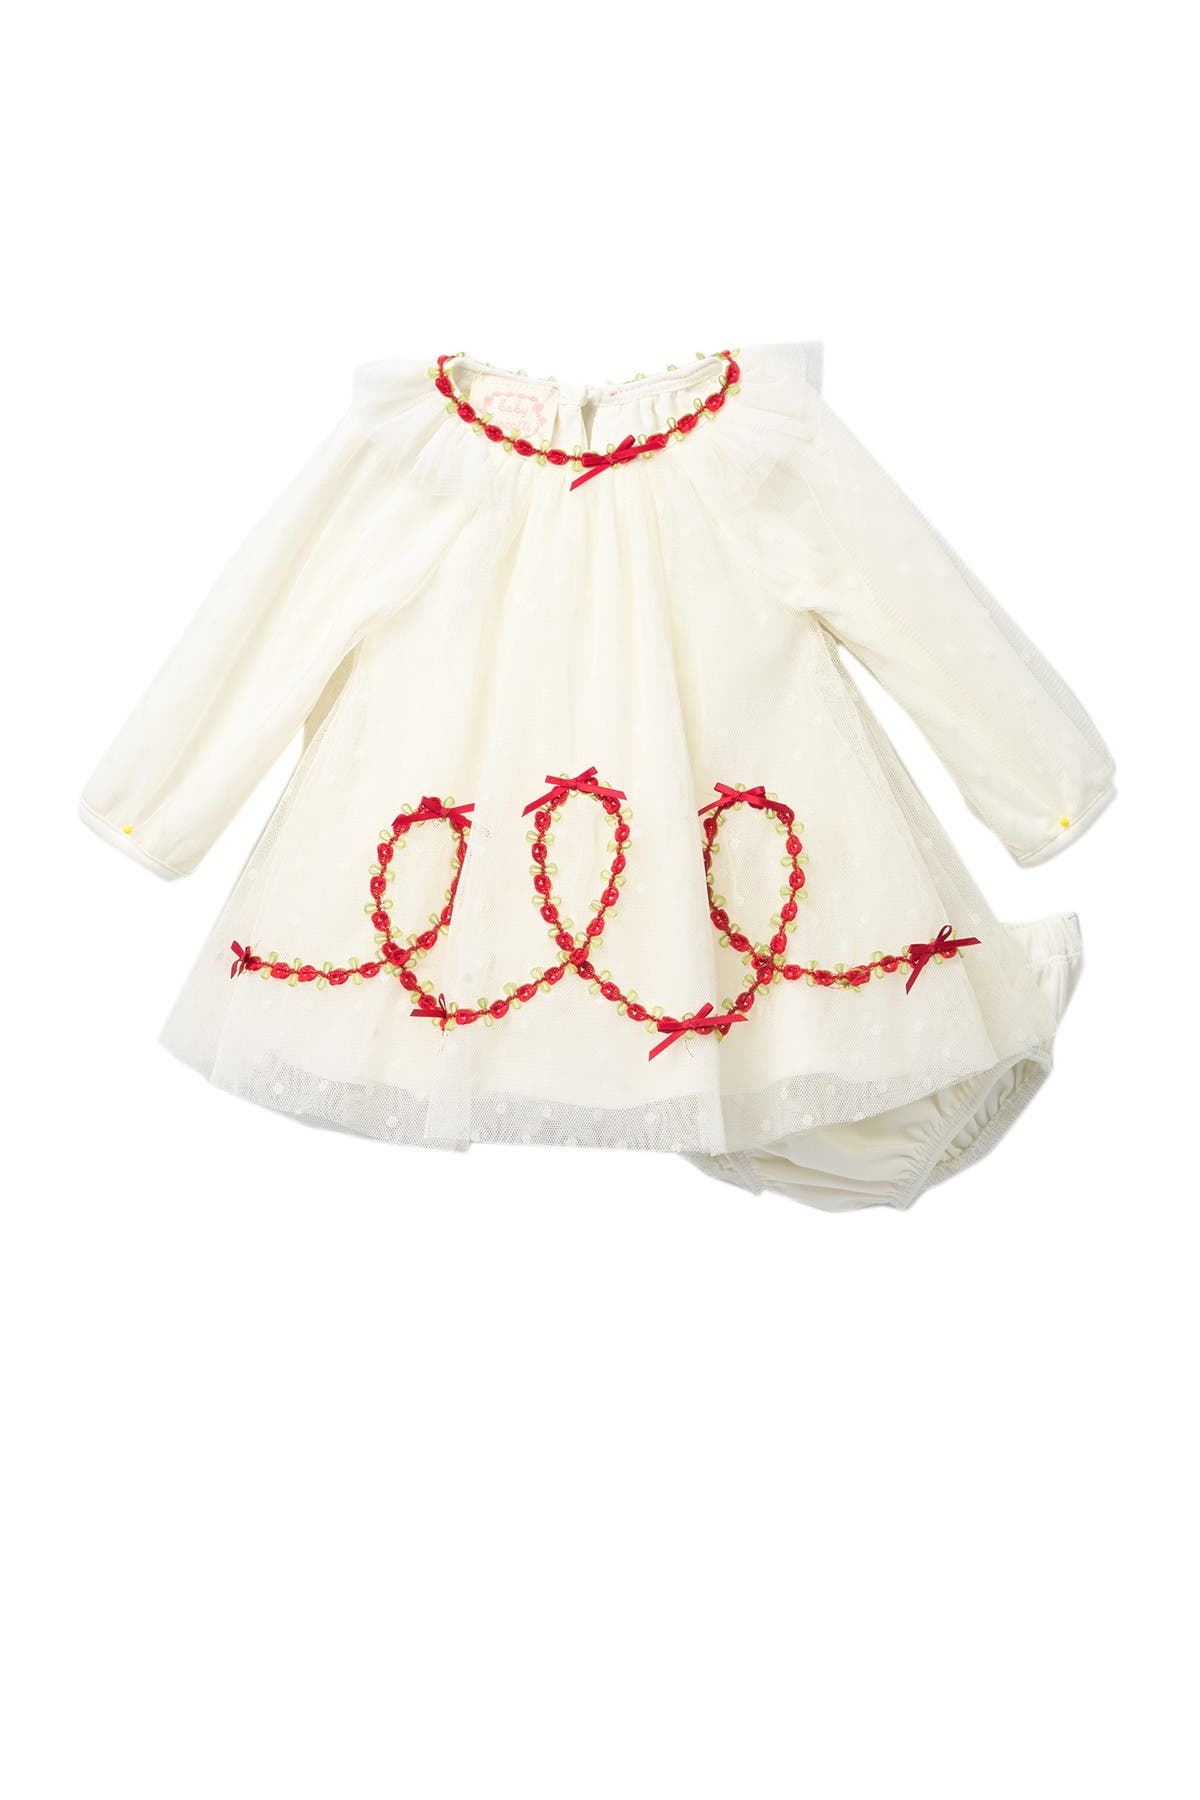 Image of BISCOTTI Puffy Sleeve Dress Set